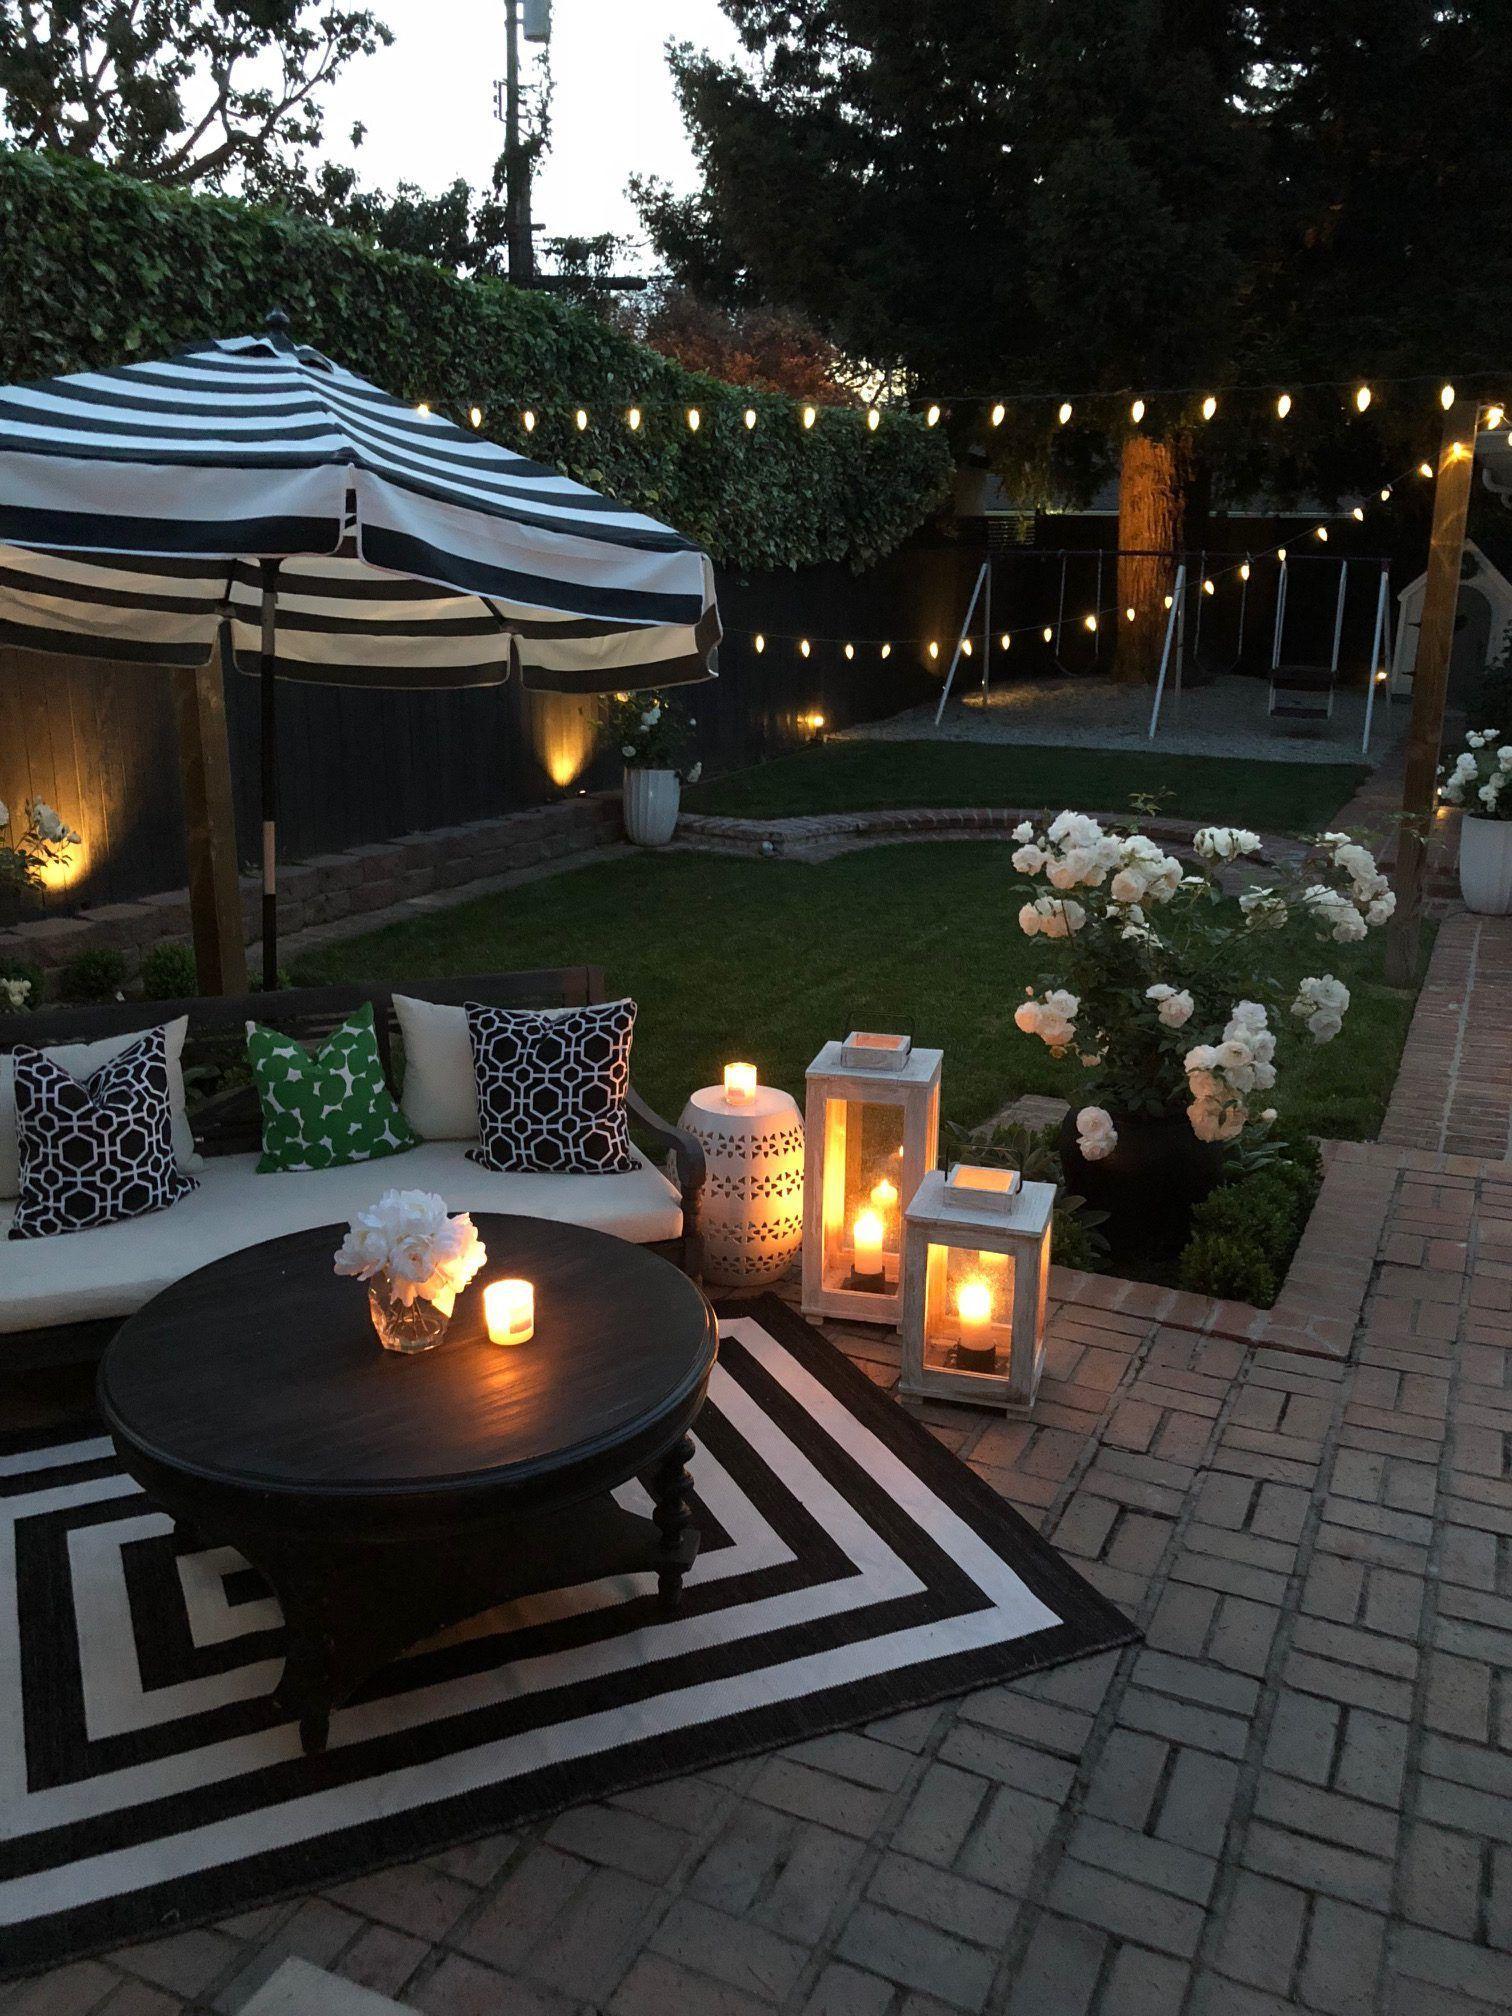 Welcome to my Spring Garden - Crazy Chic Design | Patio ...